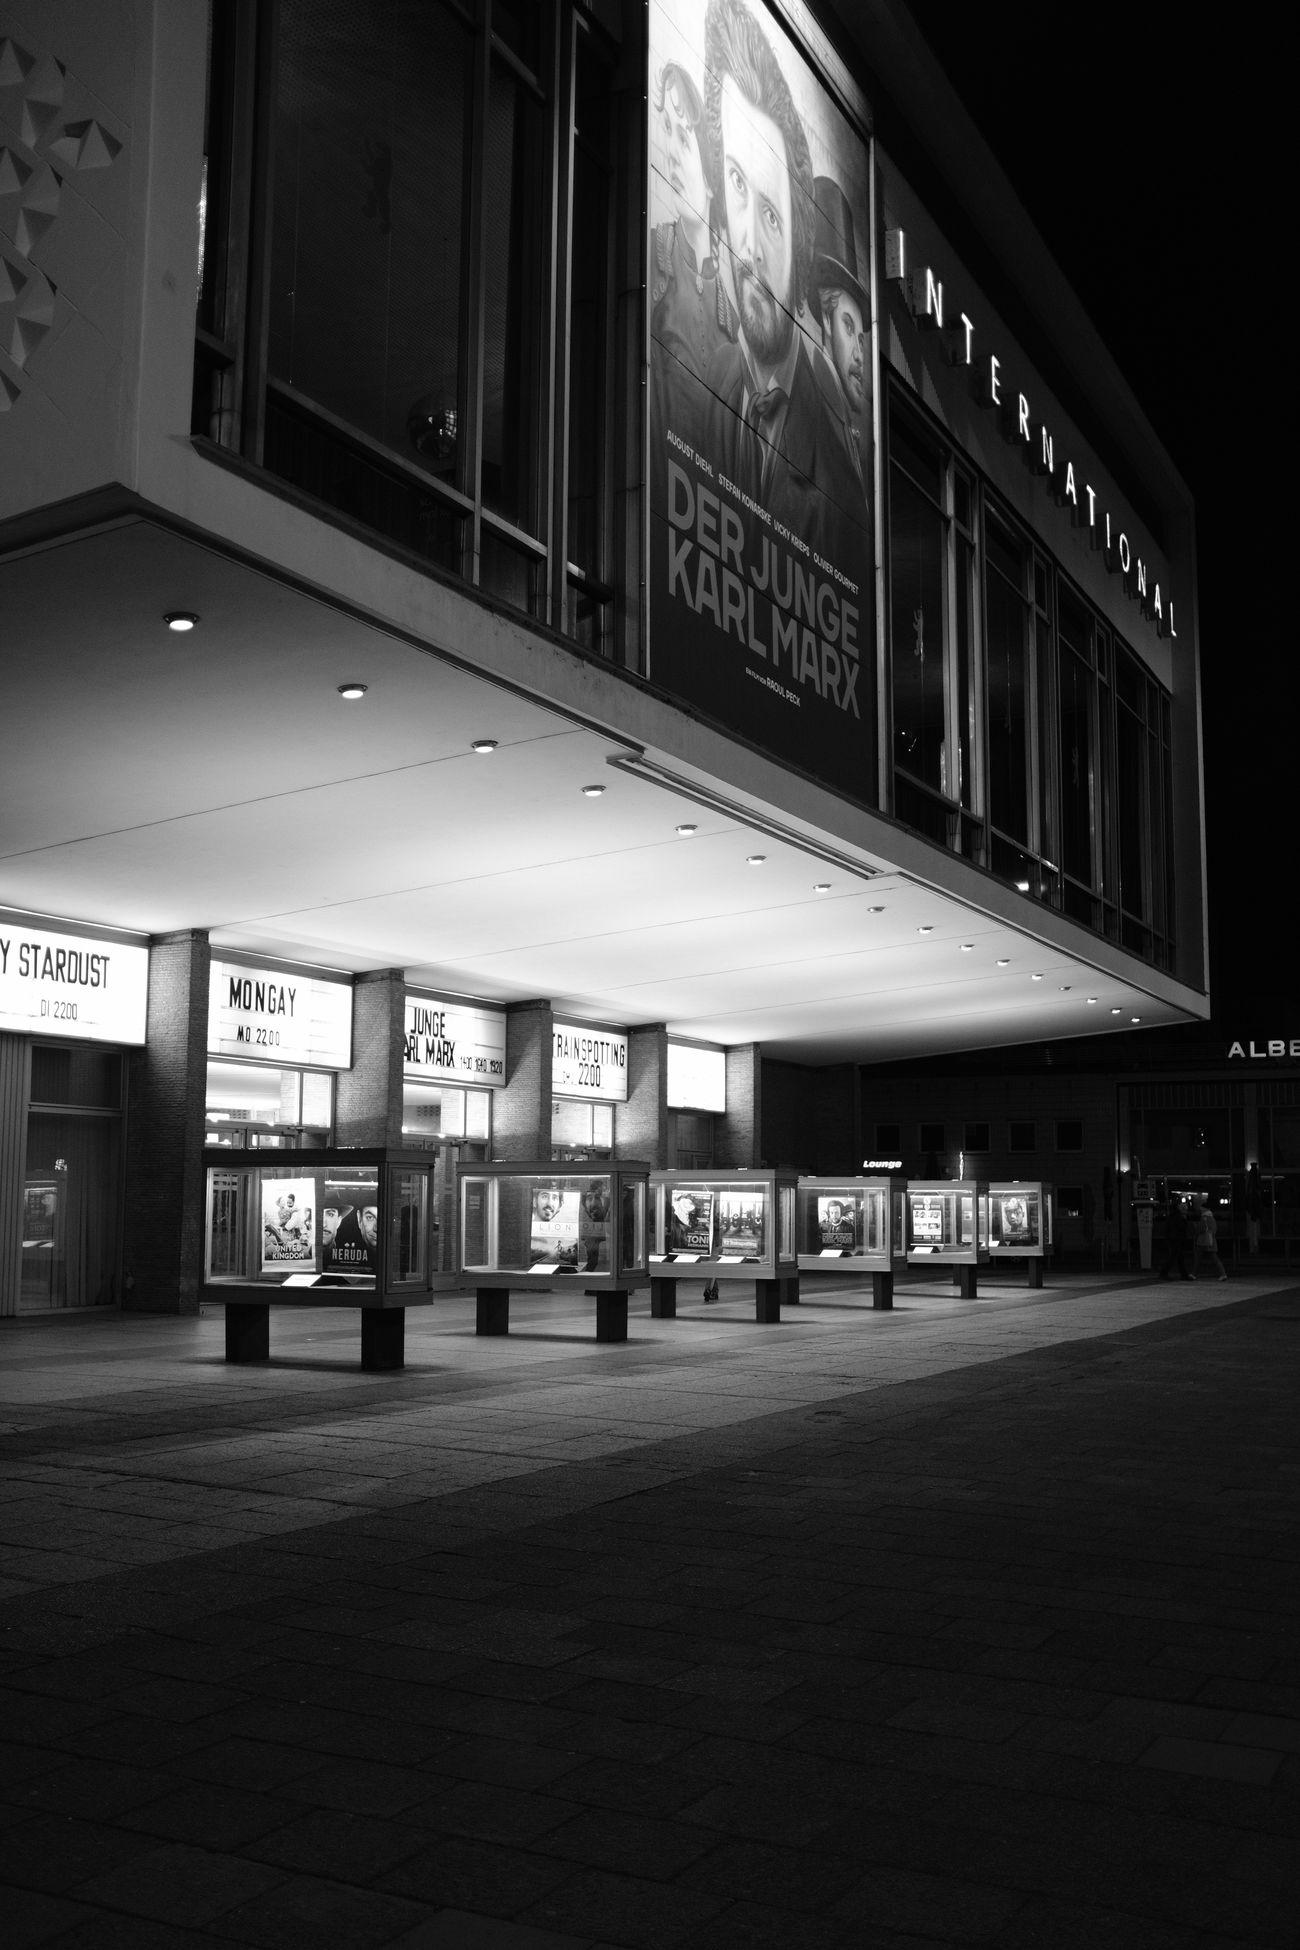 Kino International Architecture Berlin Black And White GDR Modernism Movie Theater Night Soviet Modernism X100f